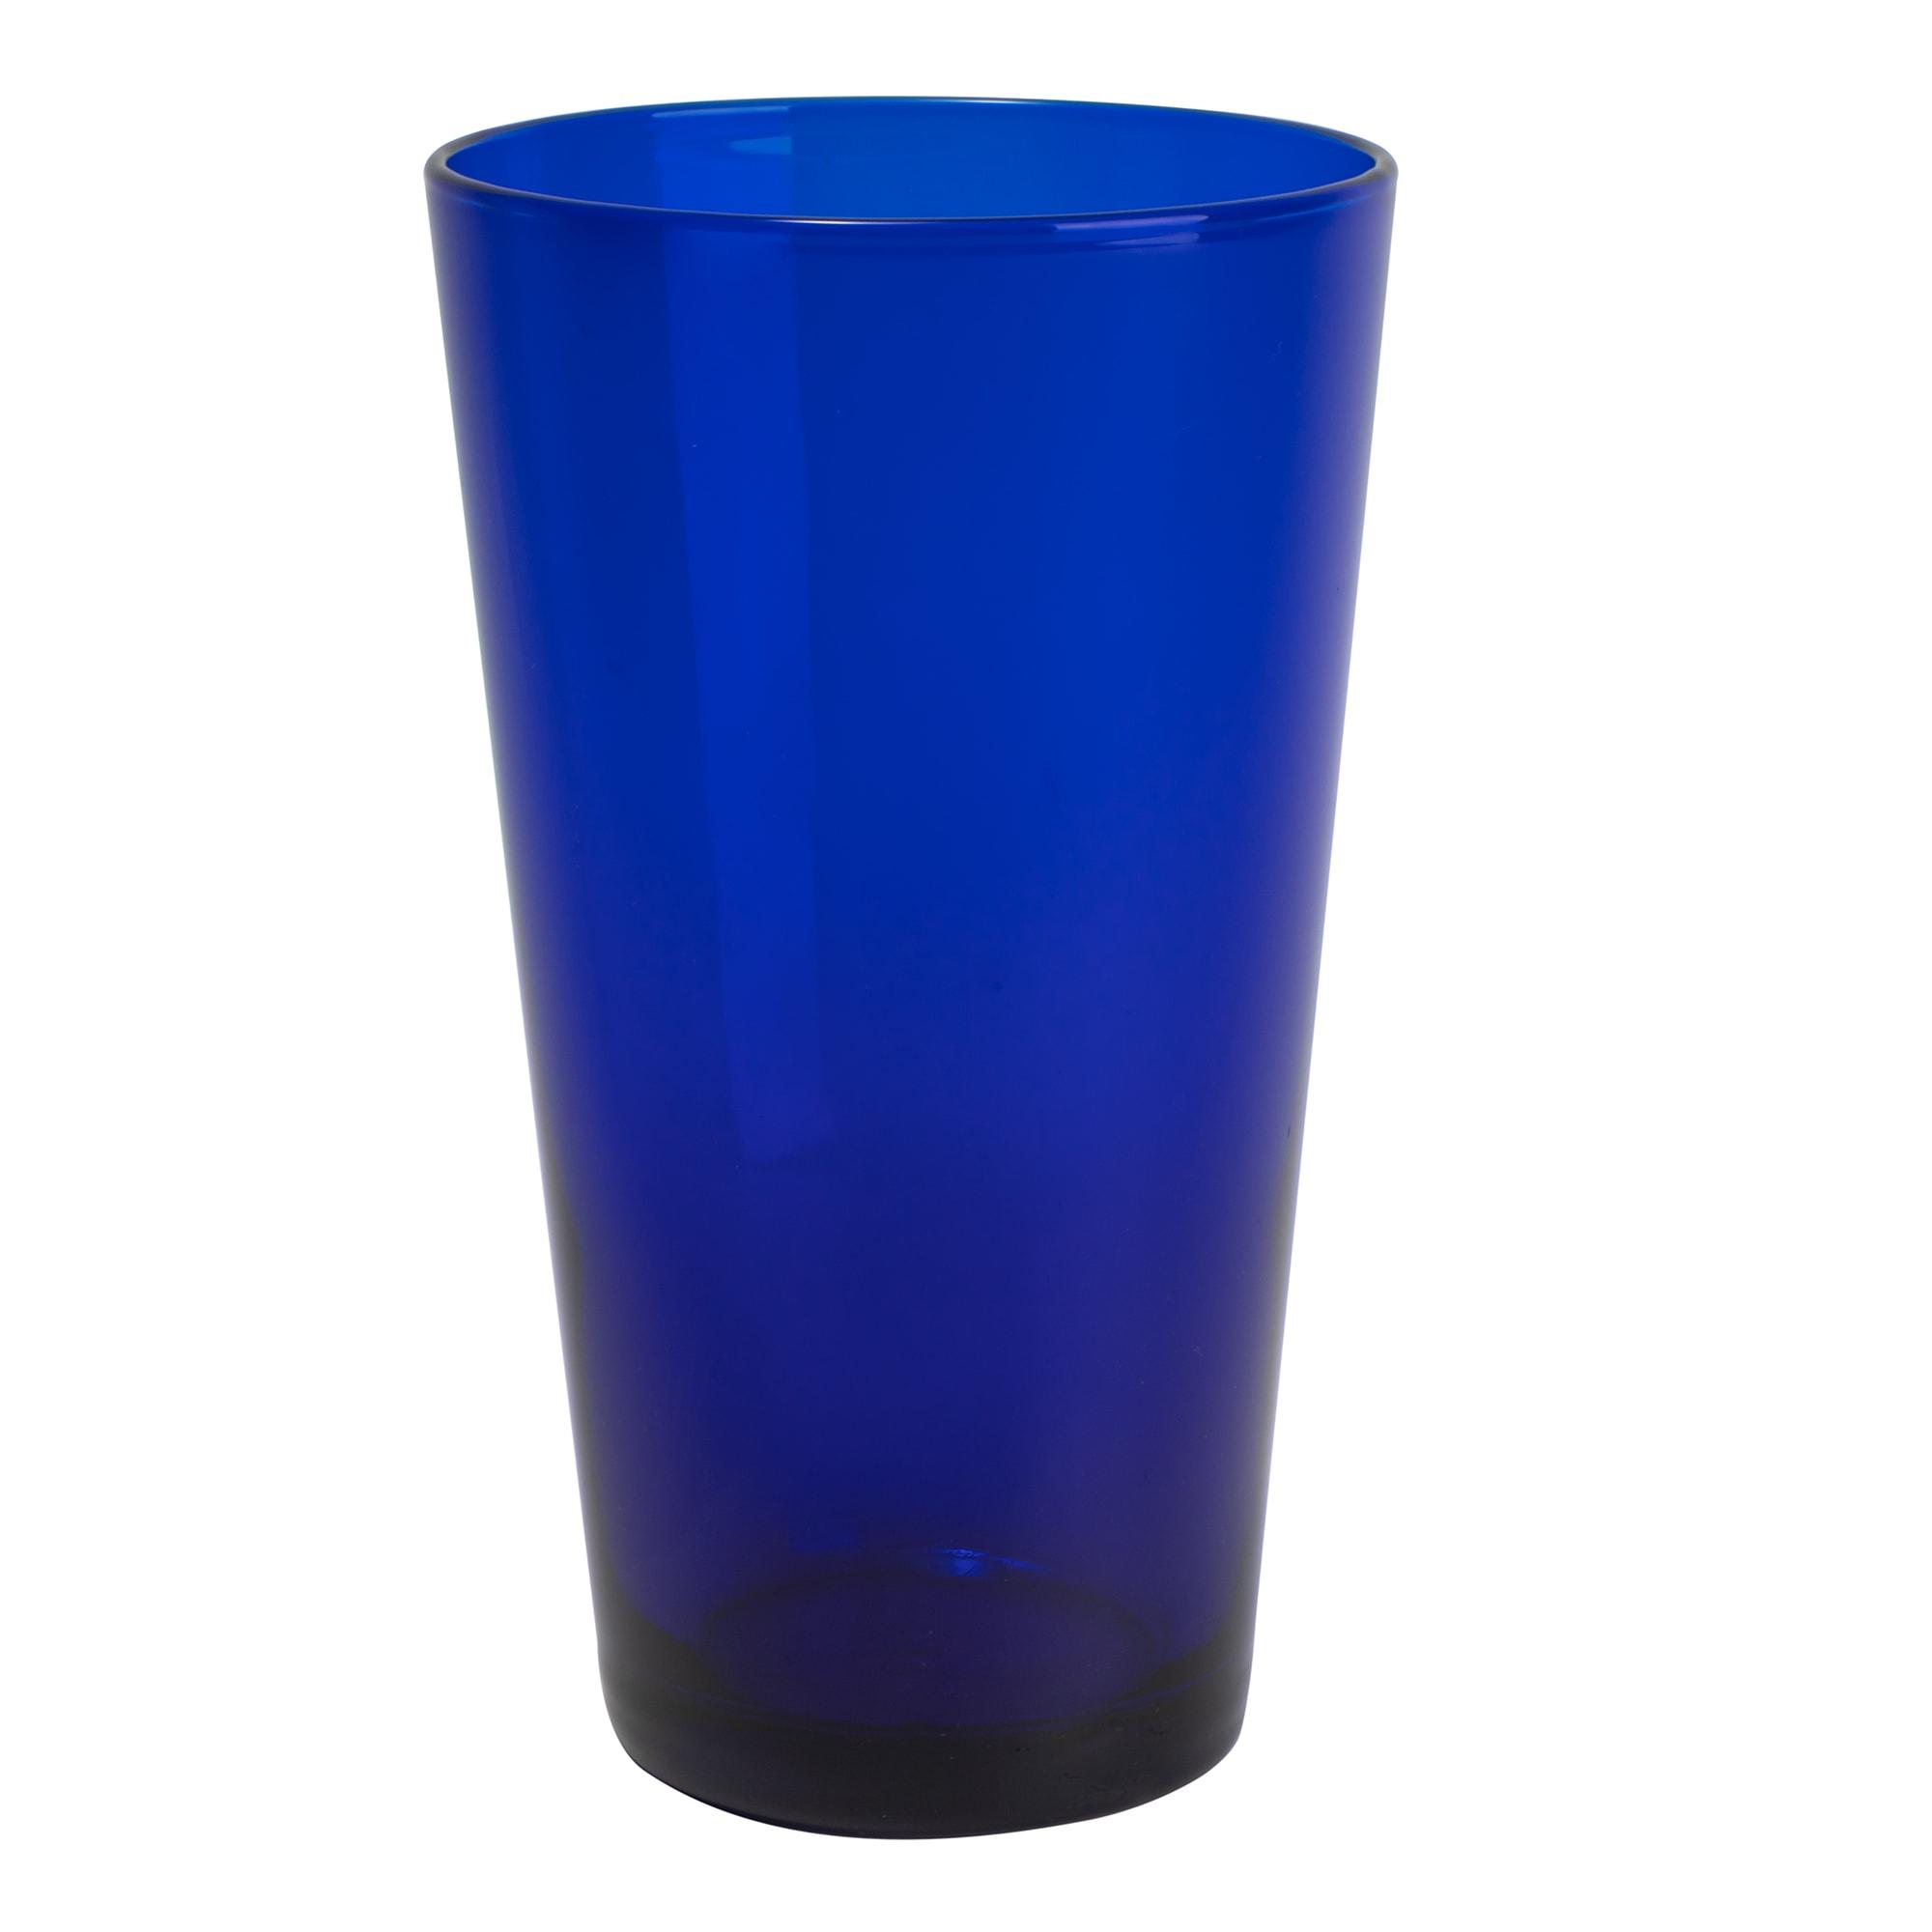 Libbey 171B 17.25 oz Flared Cobalt Cooler Glass